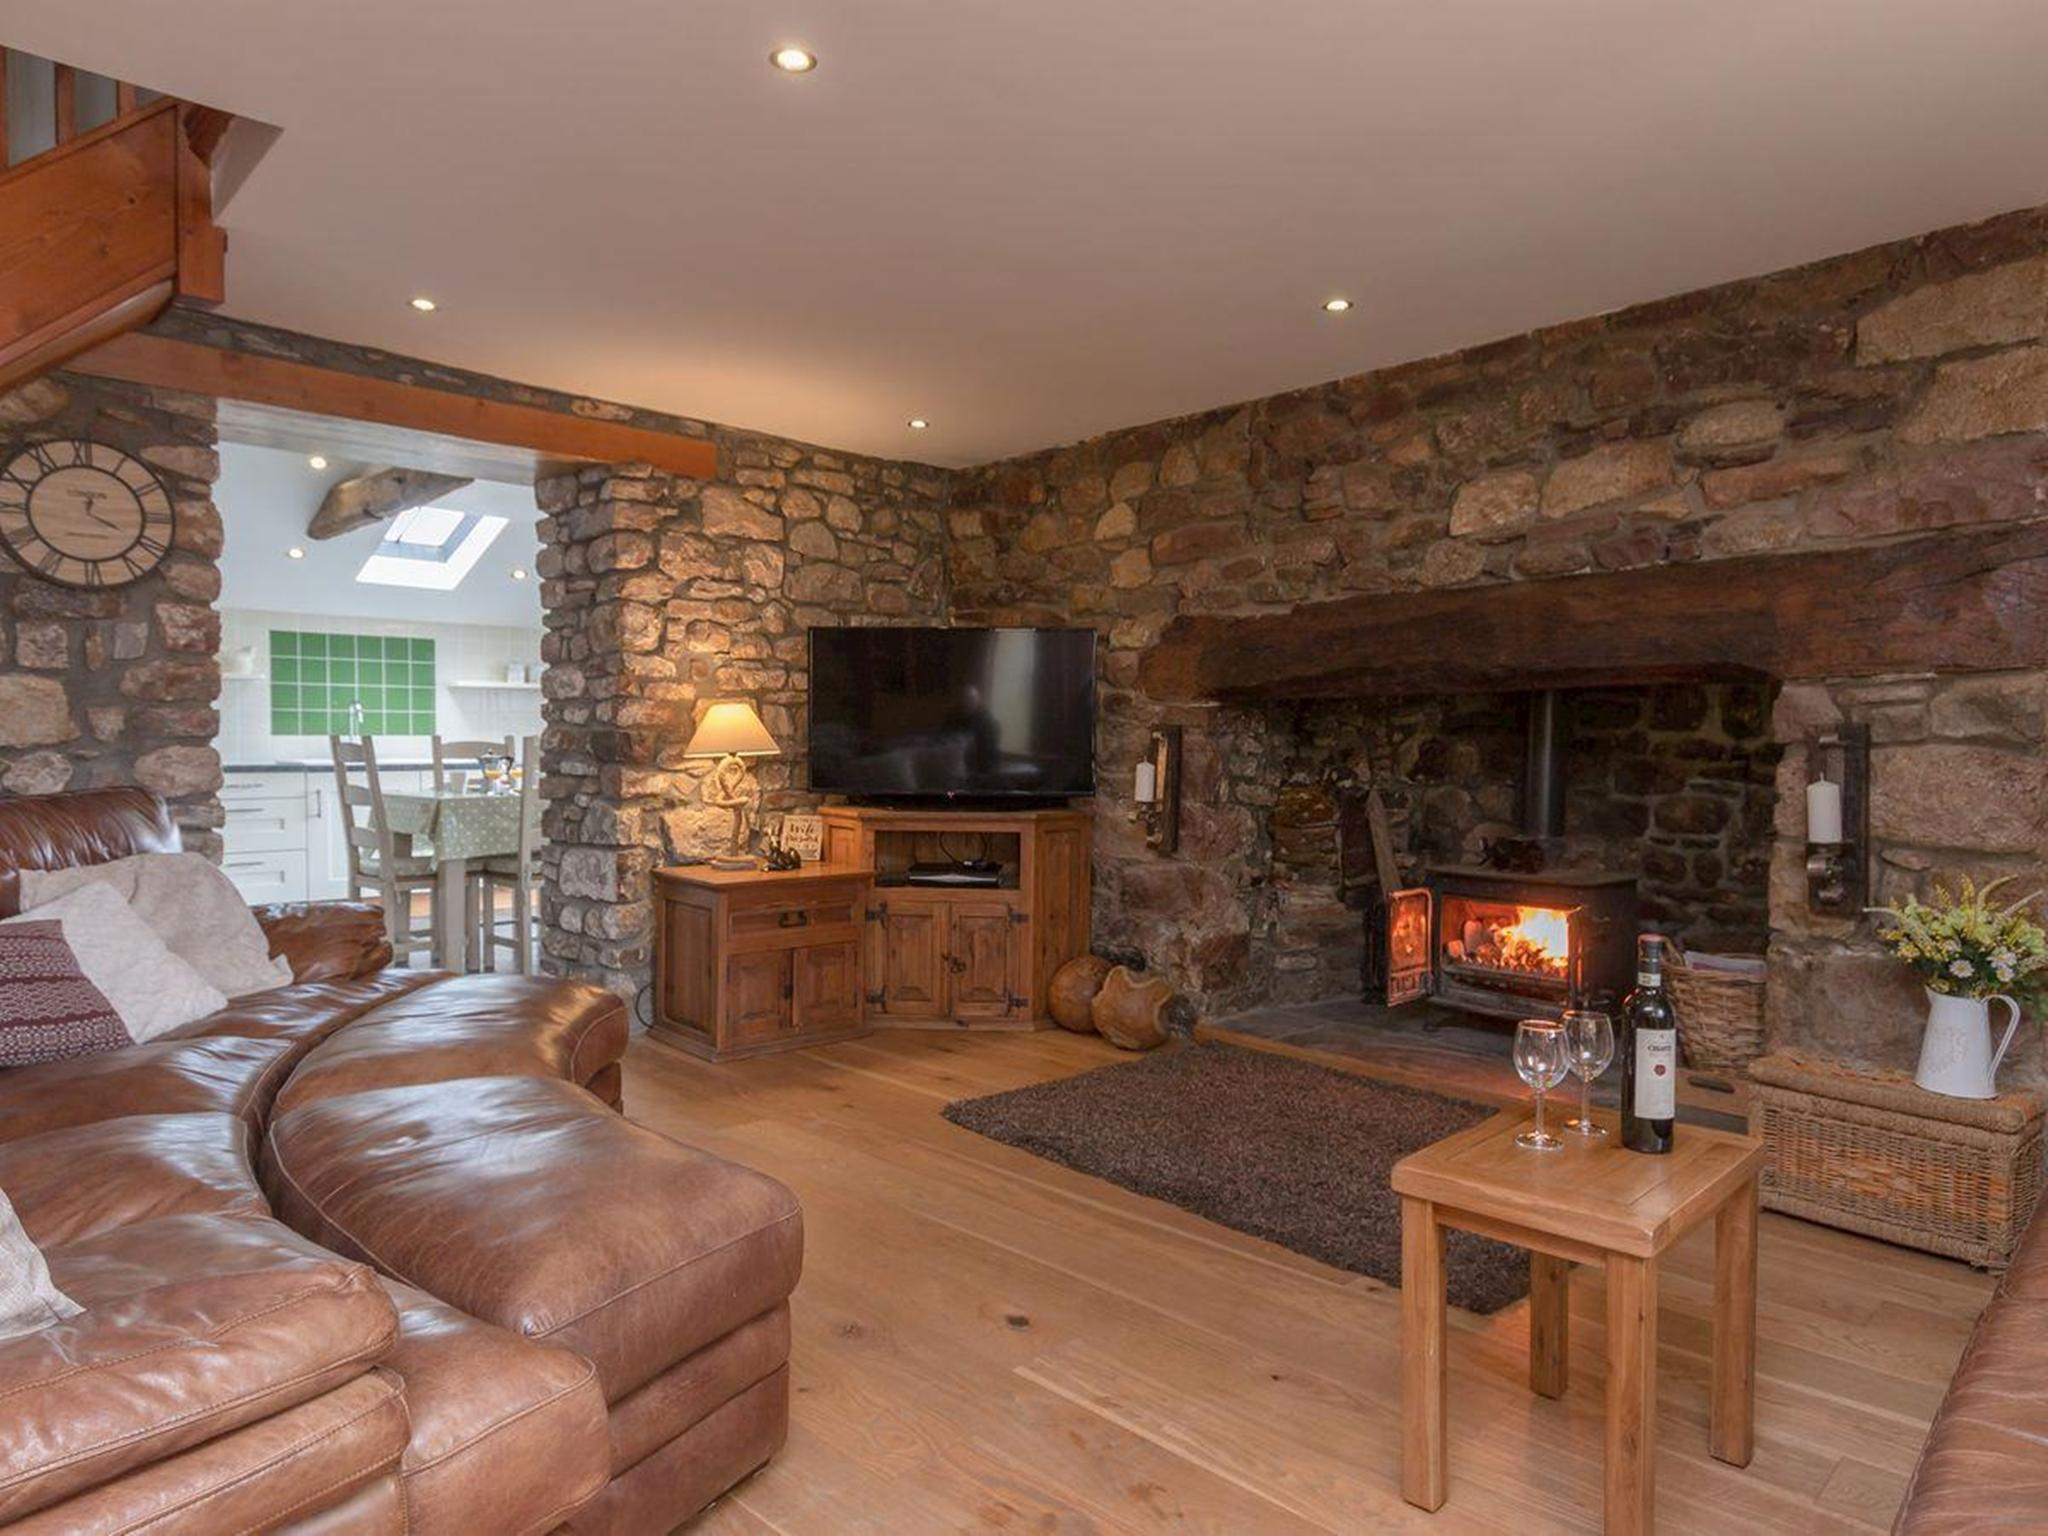 Cottage-Deluxe-Private Bathroom-Mountain View-Rhiwddu Farmhouse - 3 Night Stay - Farmhouse